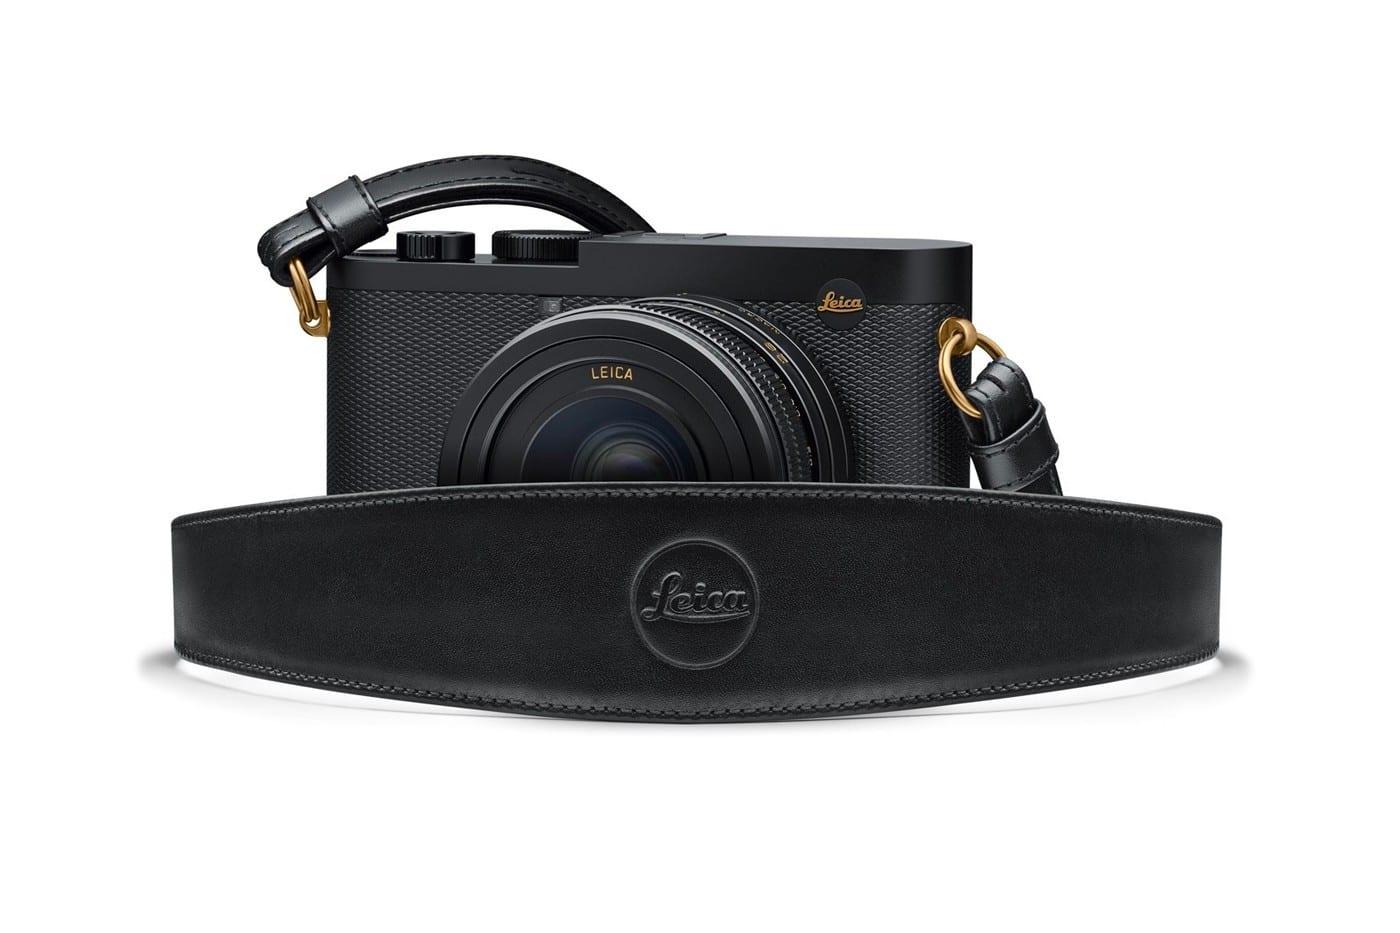 Leica James Bond Q2 φωτογραφική